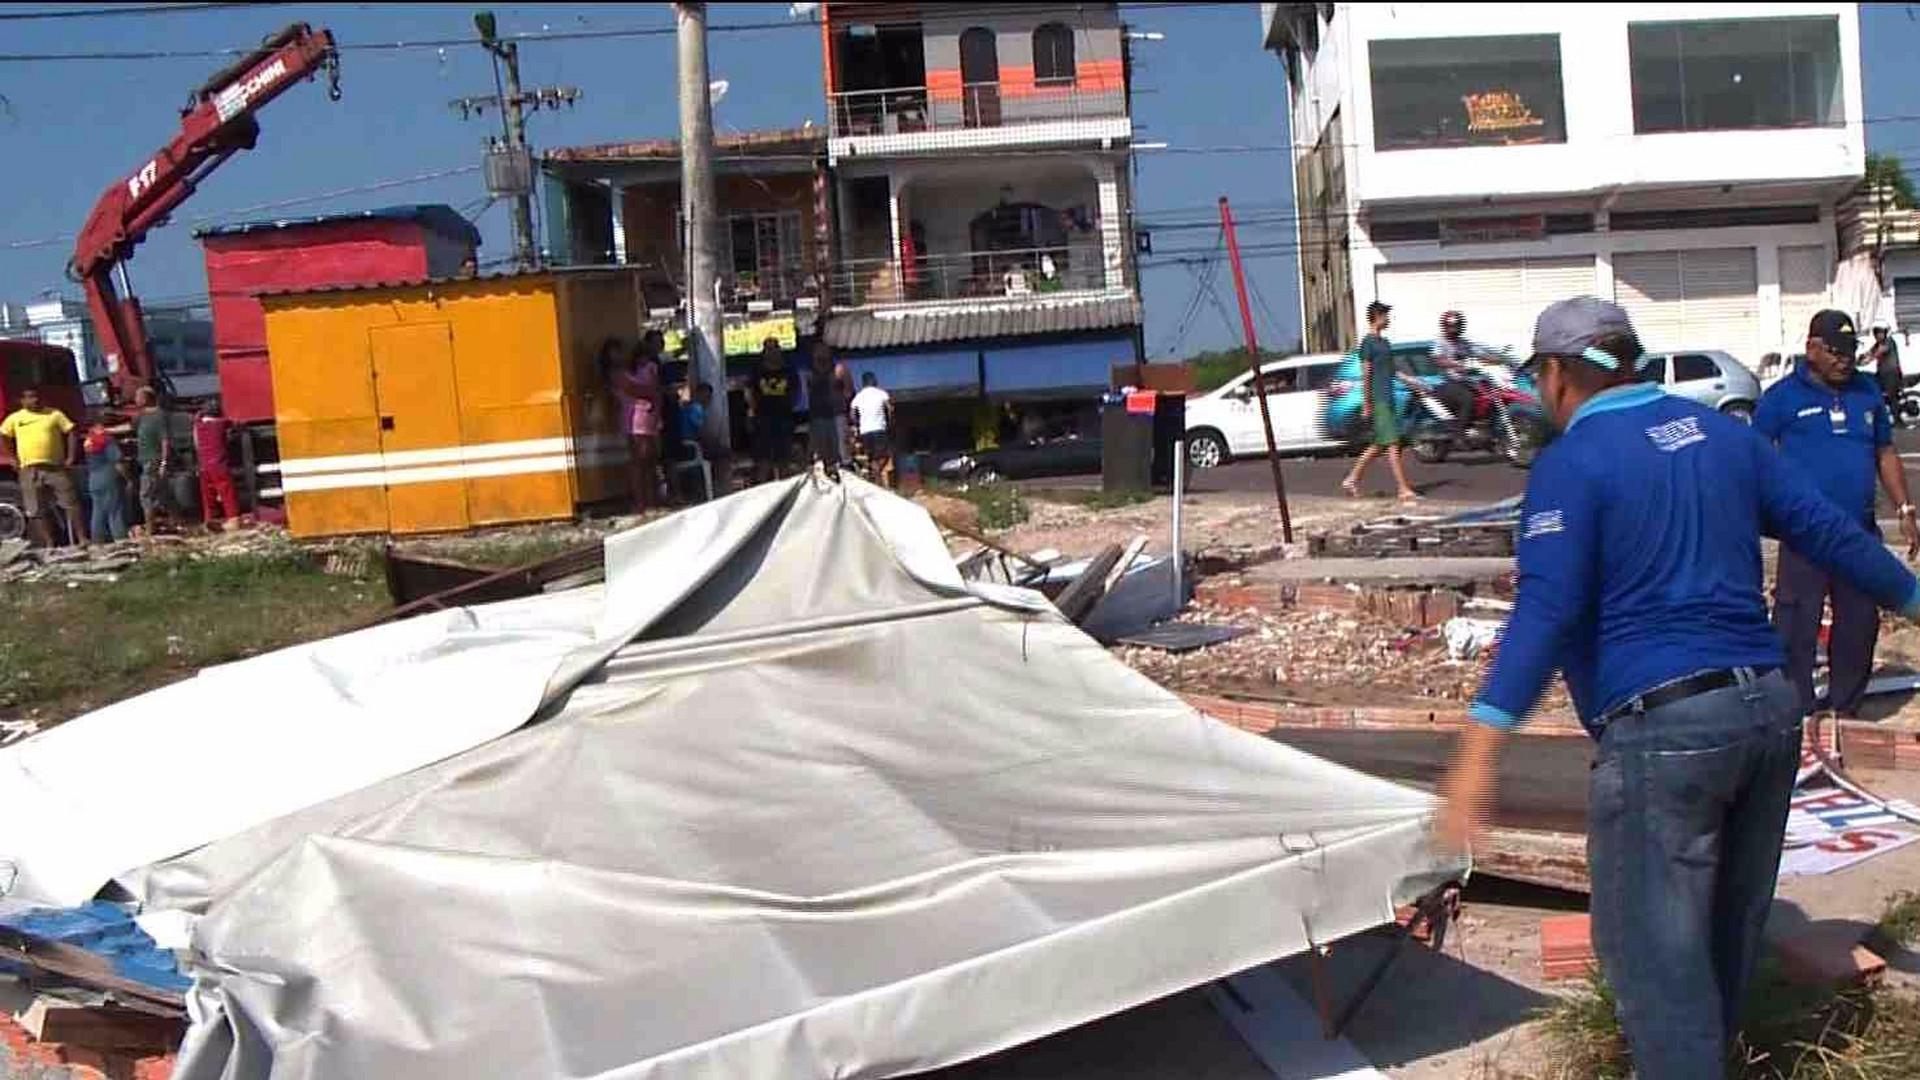 ORDEM JUDICIAL: AMBULANTES DESOCUPAM TERRENO NO ALVORADA - Alô Amazonas - 16/08/17